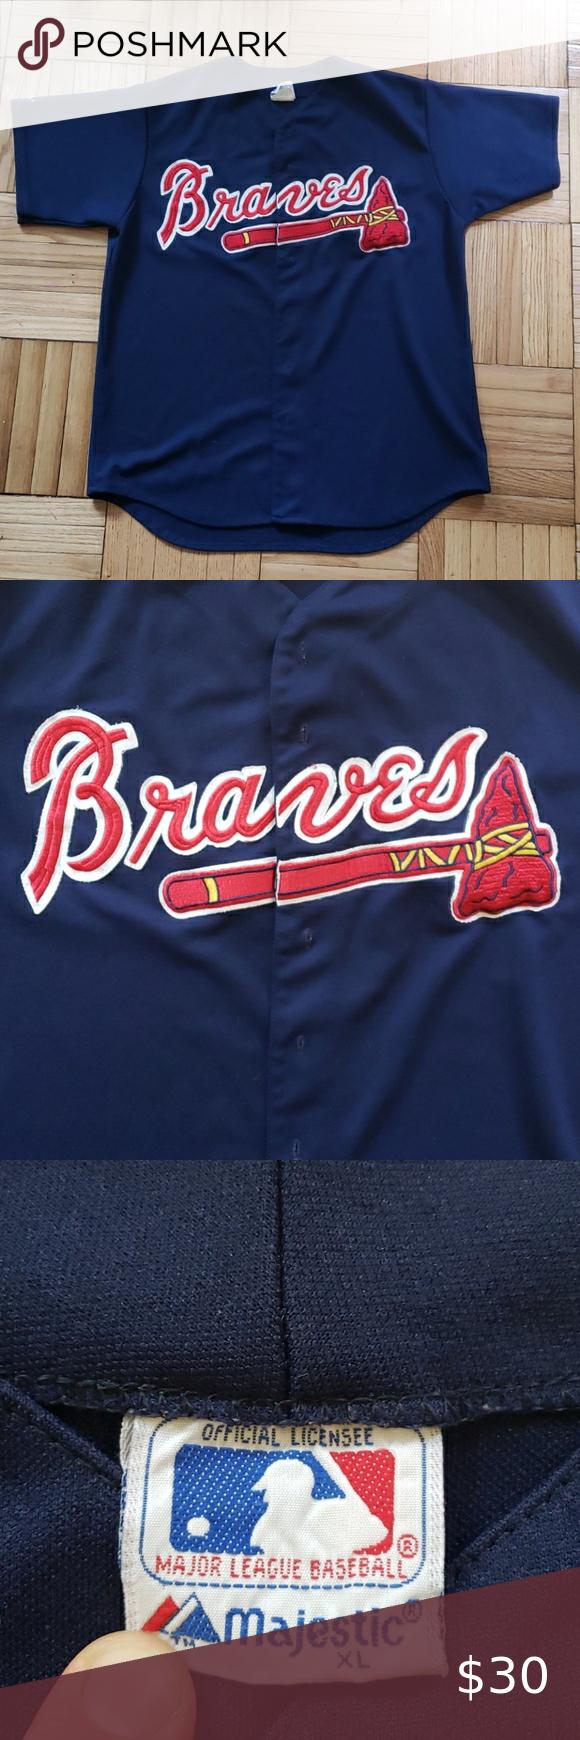 Throwback Uniforms Mlb Uniforms Baseball Uniforms Throwback